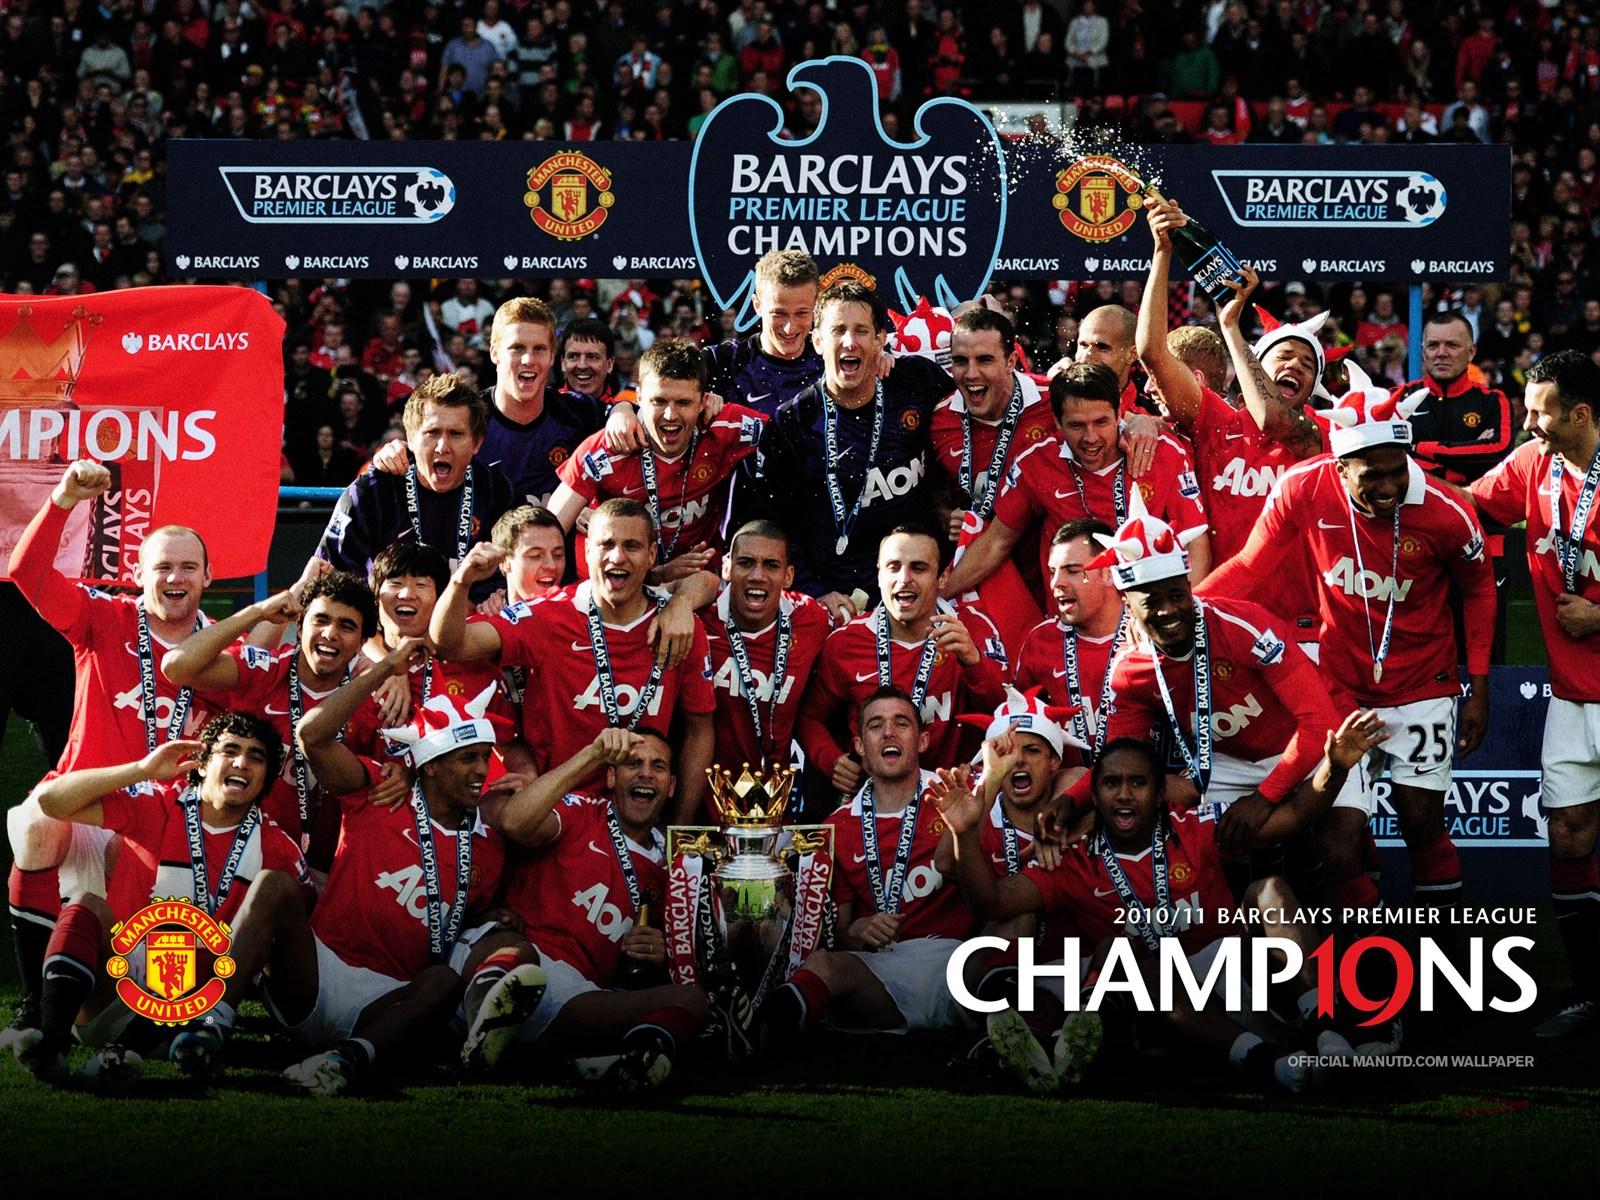 http://2.bp.blogspot.com/-u4gq7nh9bvk/TdmPRmMY9SI/AAAAAAAAAbE/dlZbr_bv2mg/s1600/Champions19-Trophy-2.jpg